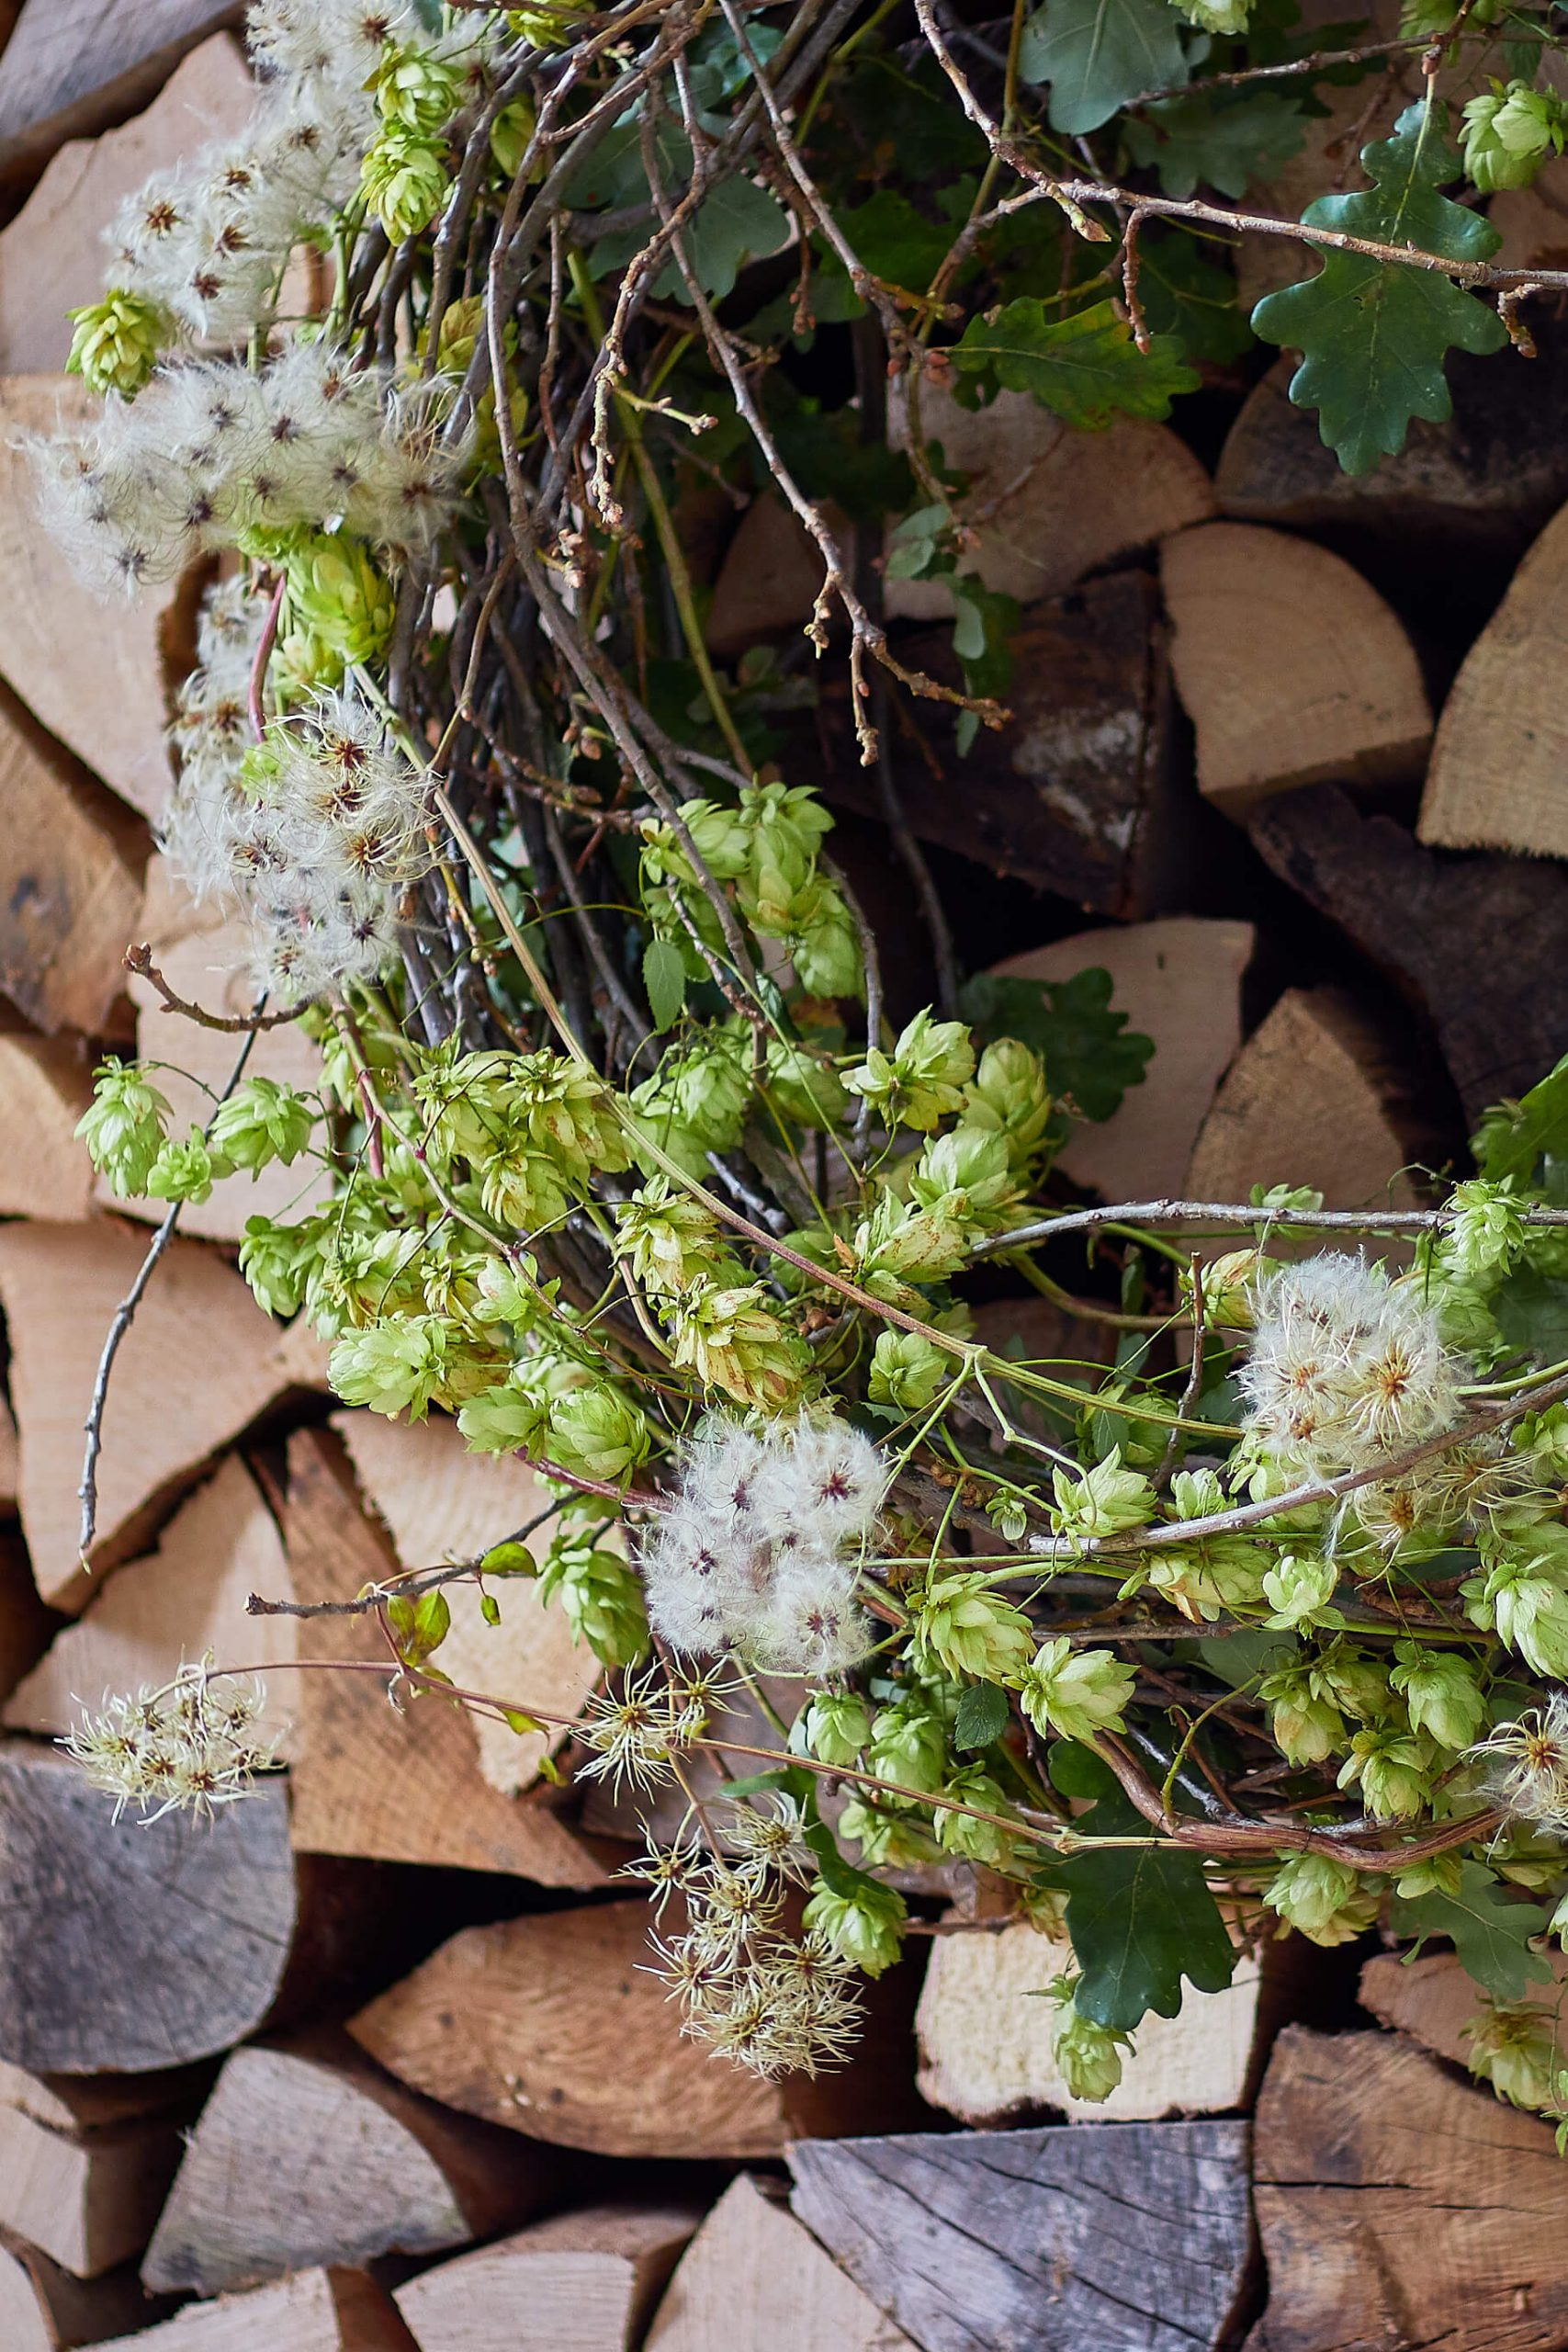 Wild and natural wreath from Radko Ivanov Chapov